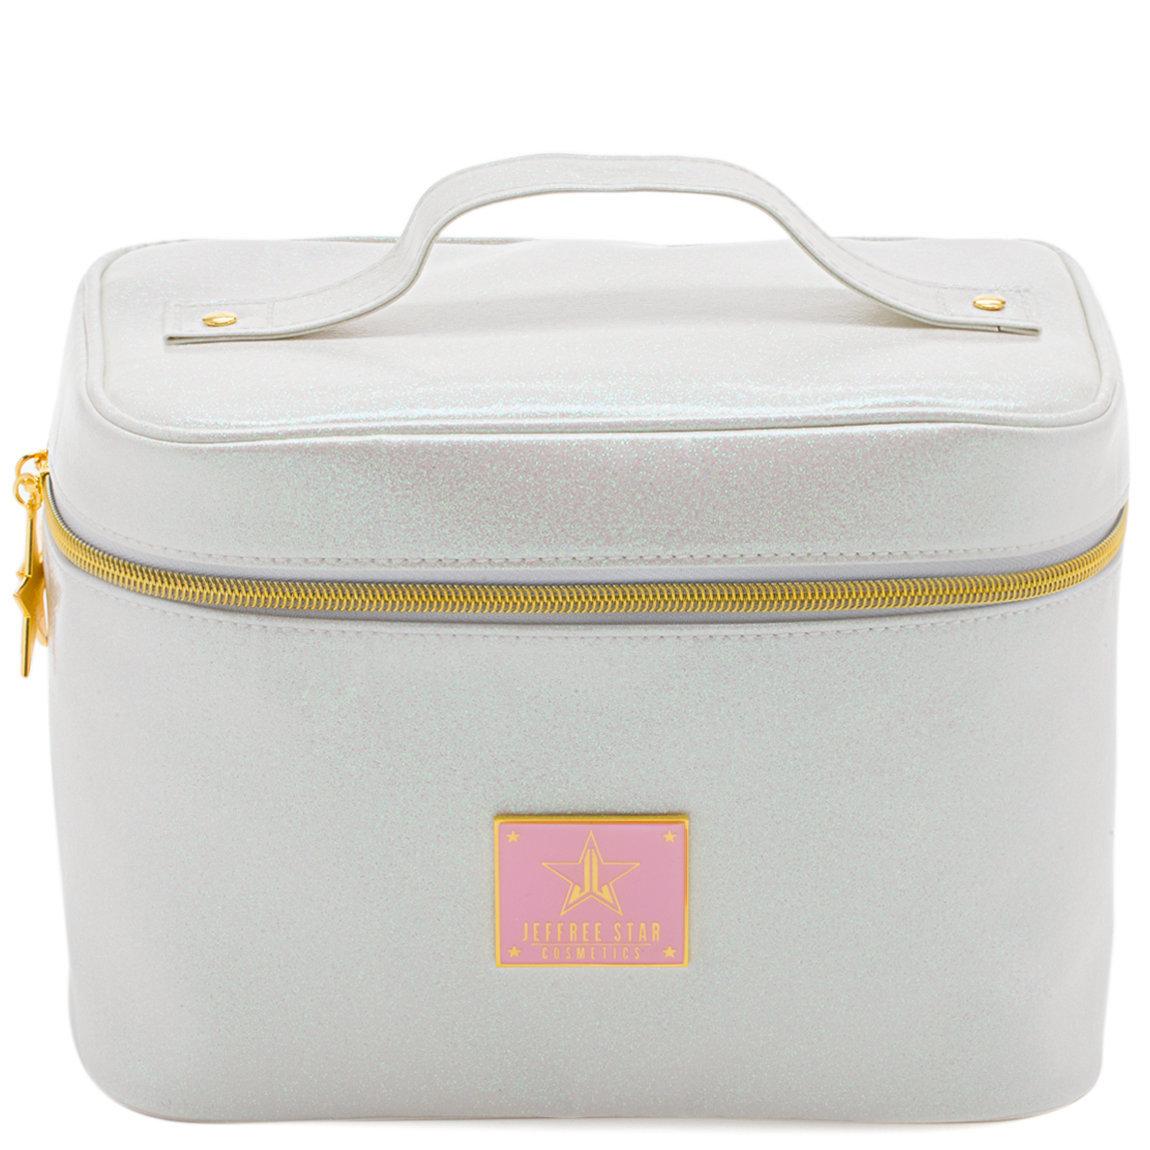 Jeffree Star Cosmetics Travel Makeup Bag Glitter White product smear.